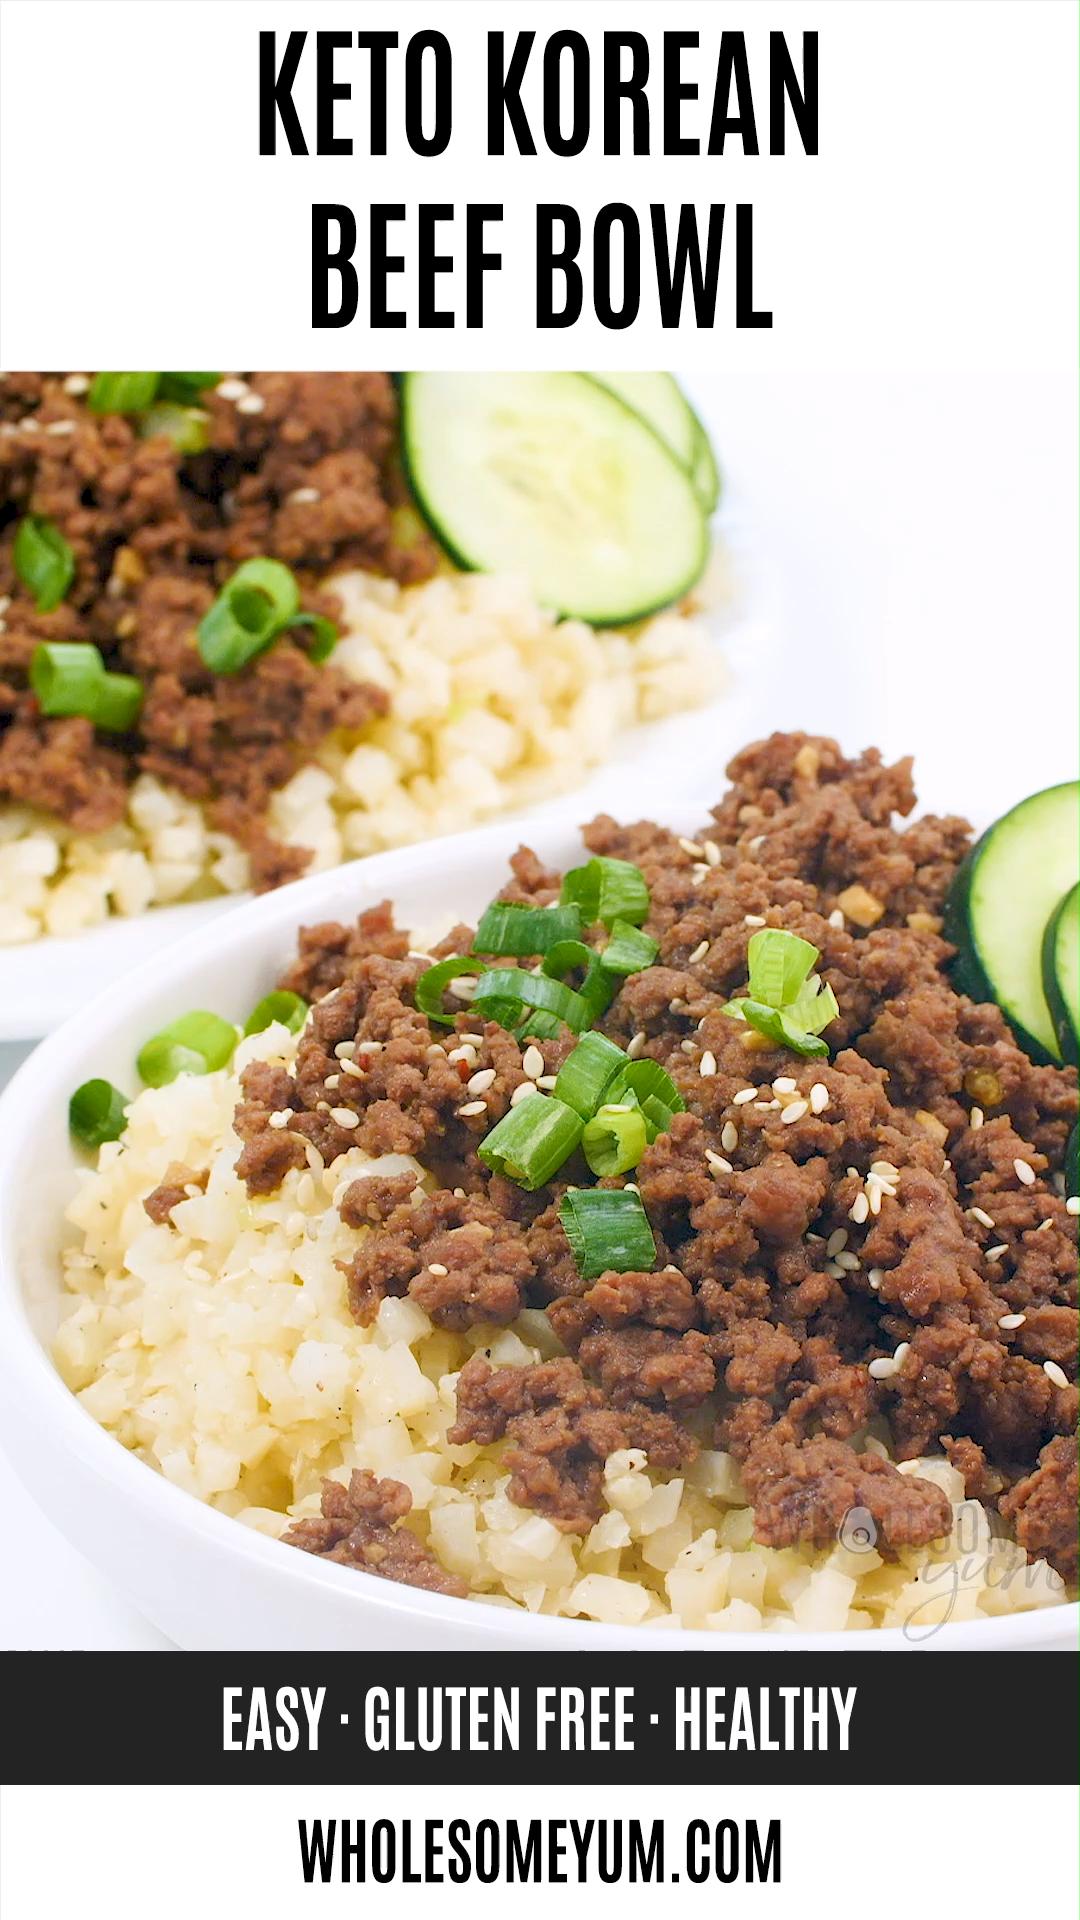 Easy Keto Korean Ground Beef Bowl Recipe